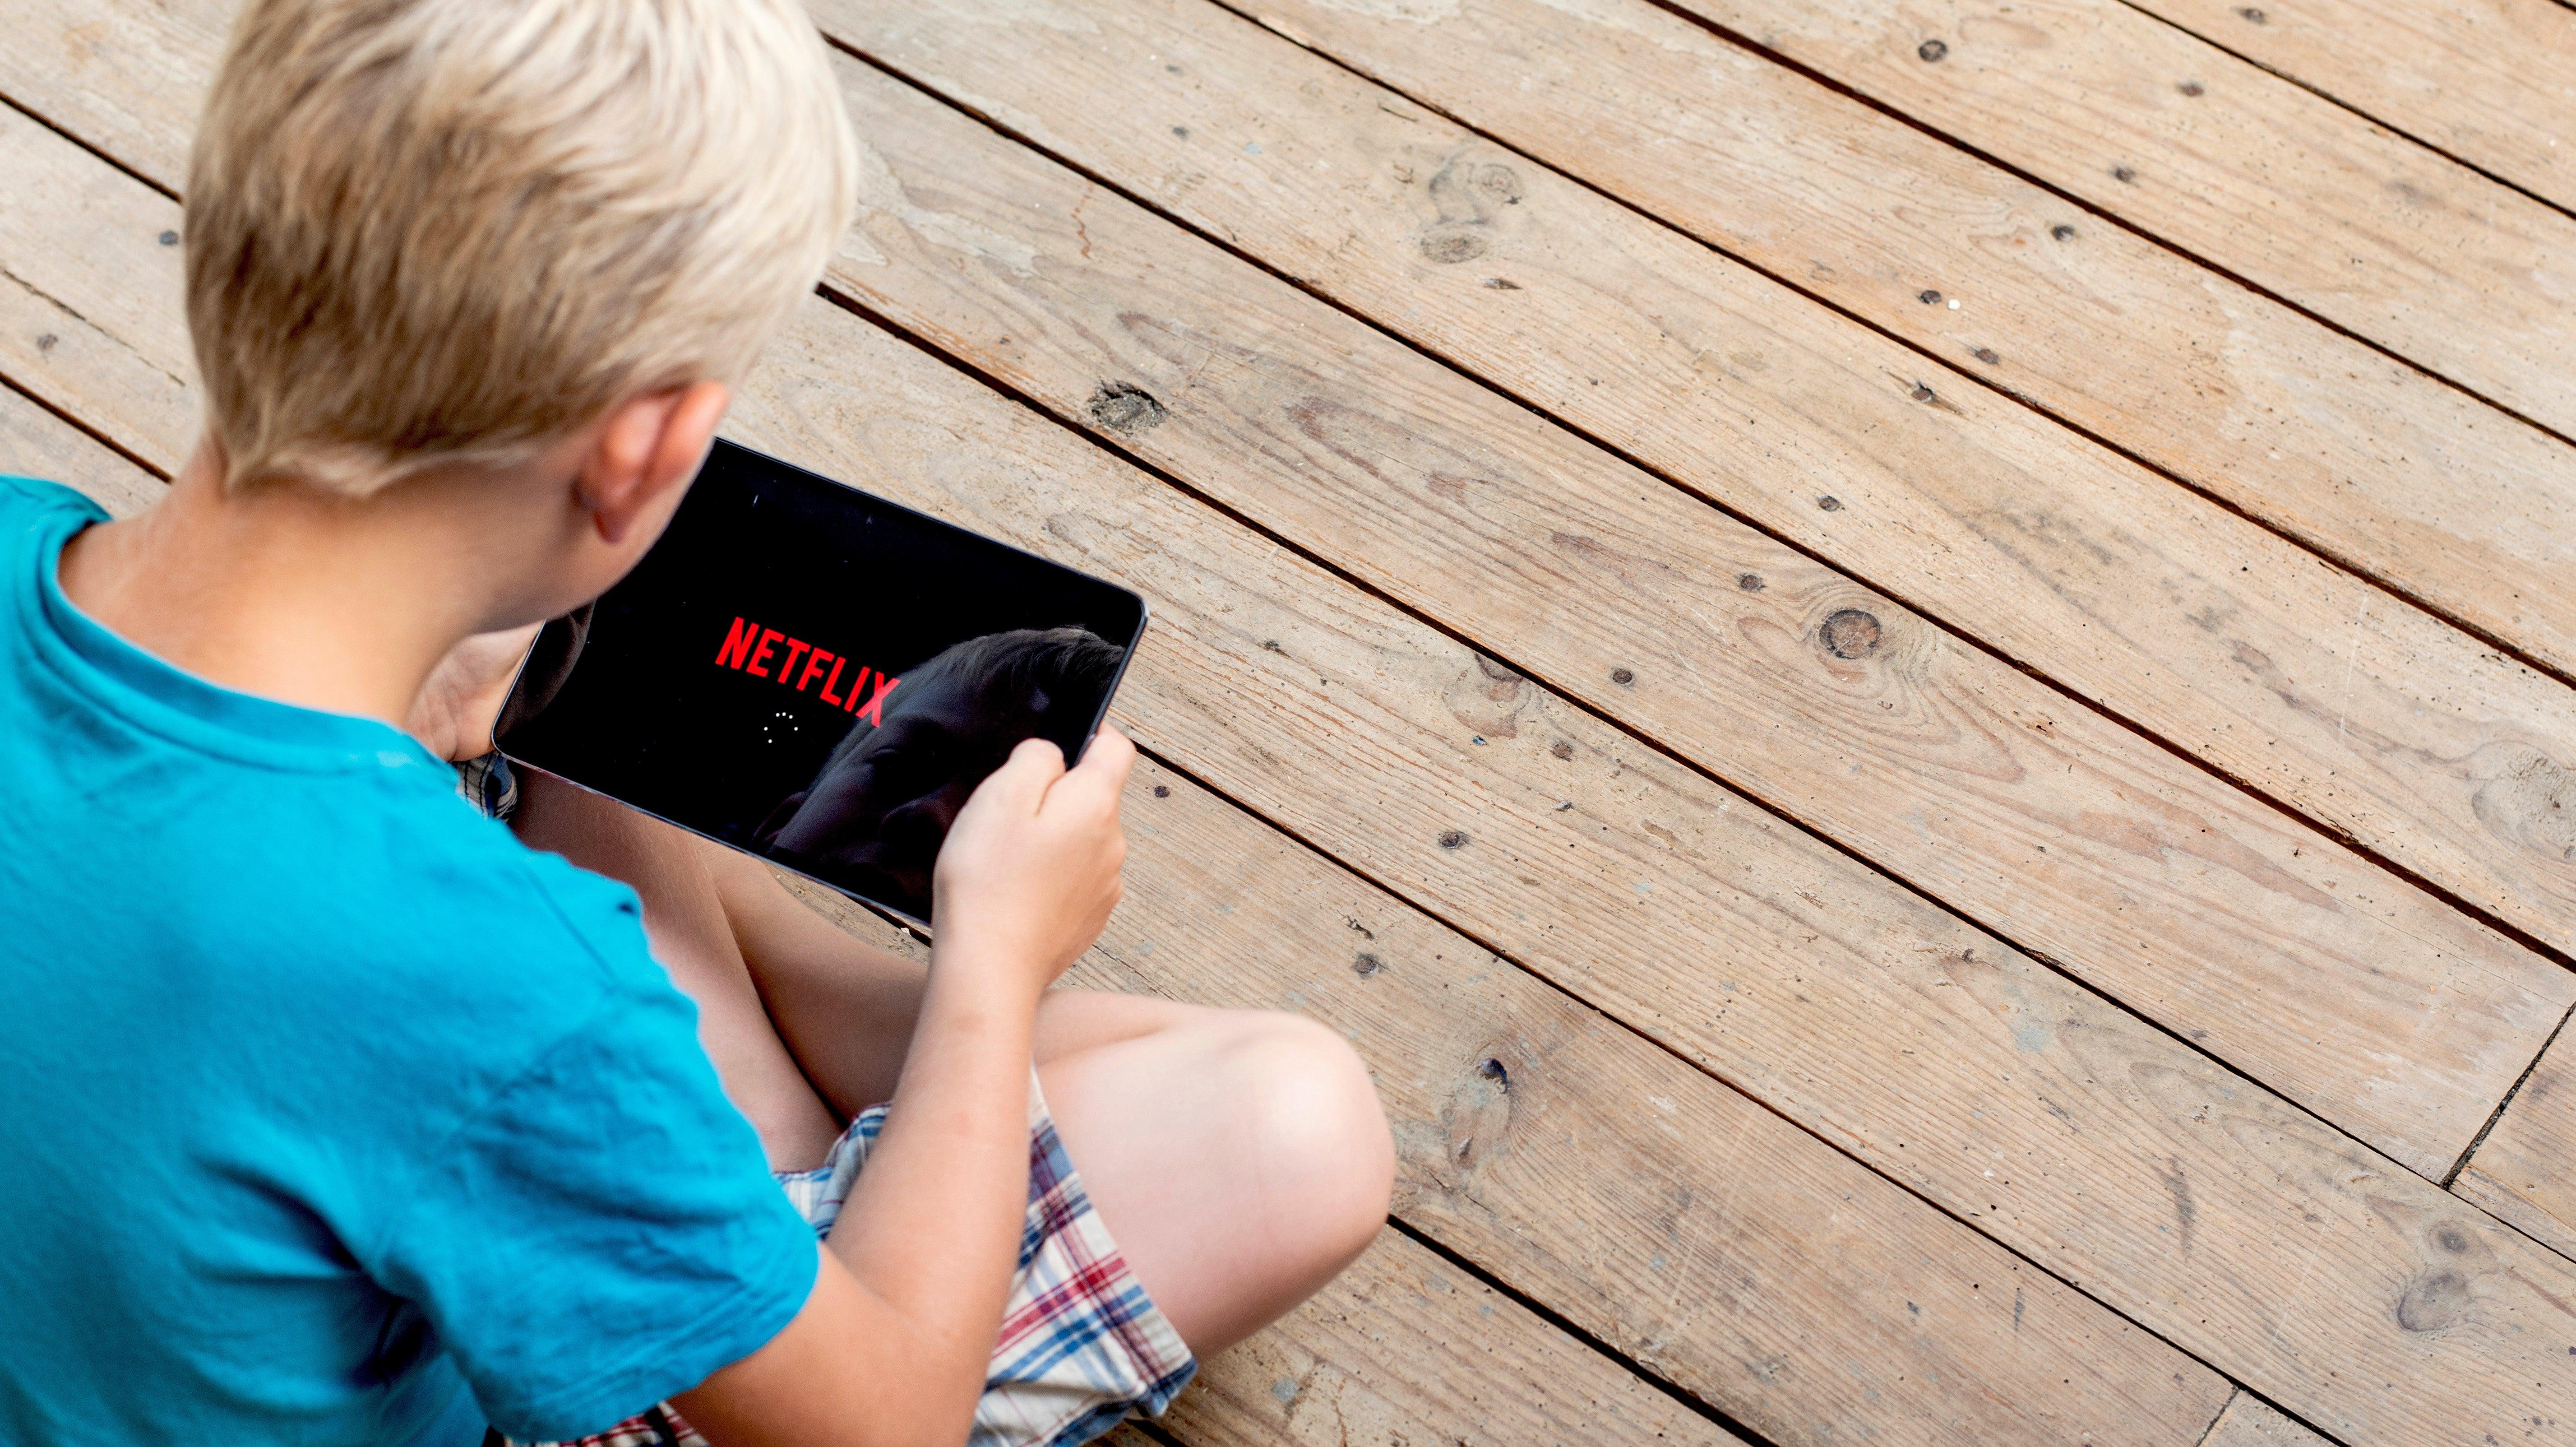 Netflix Just Released New Parental Controls